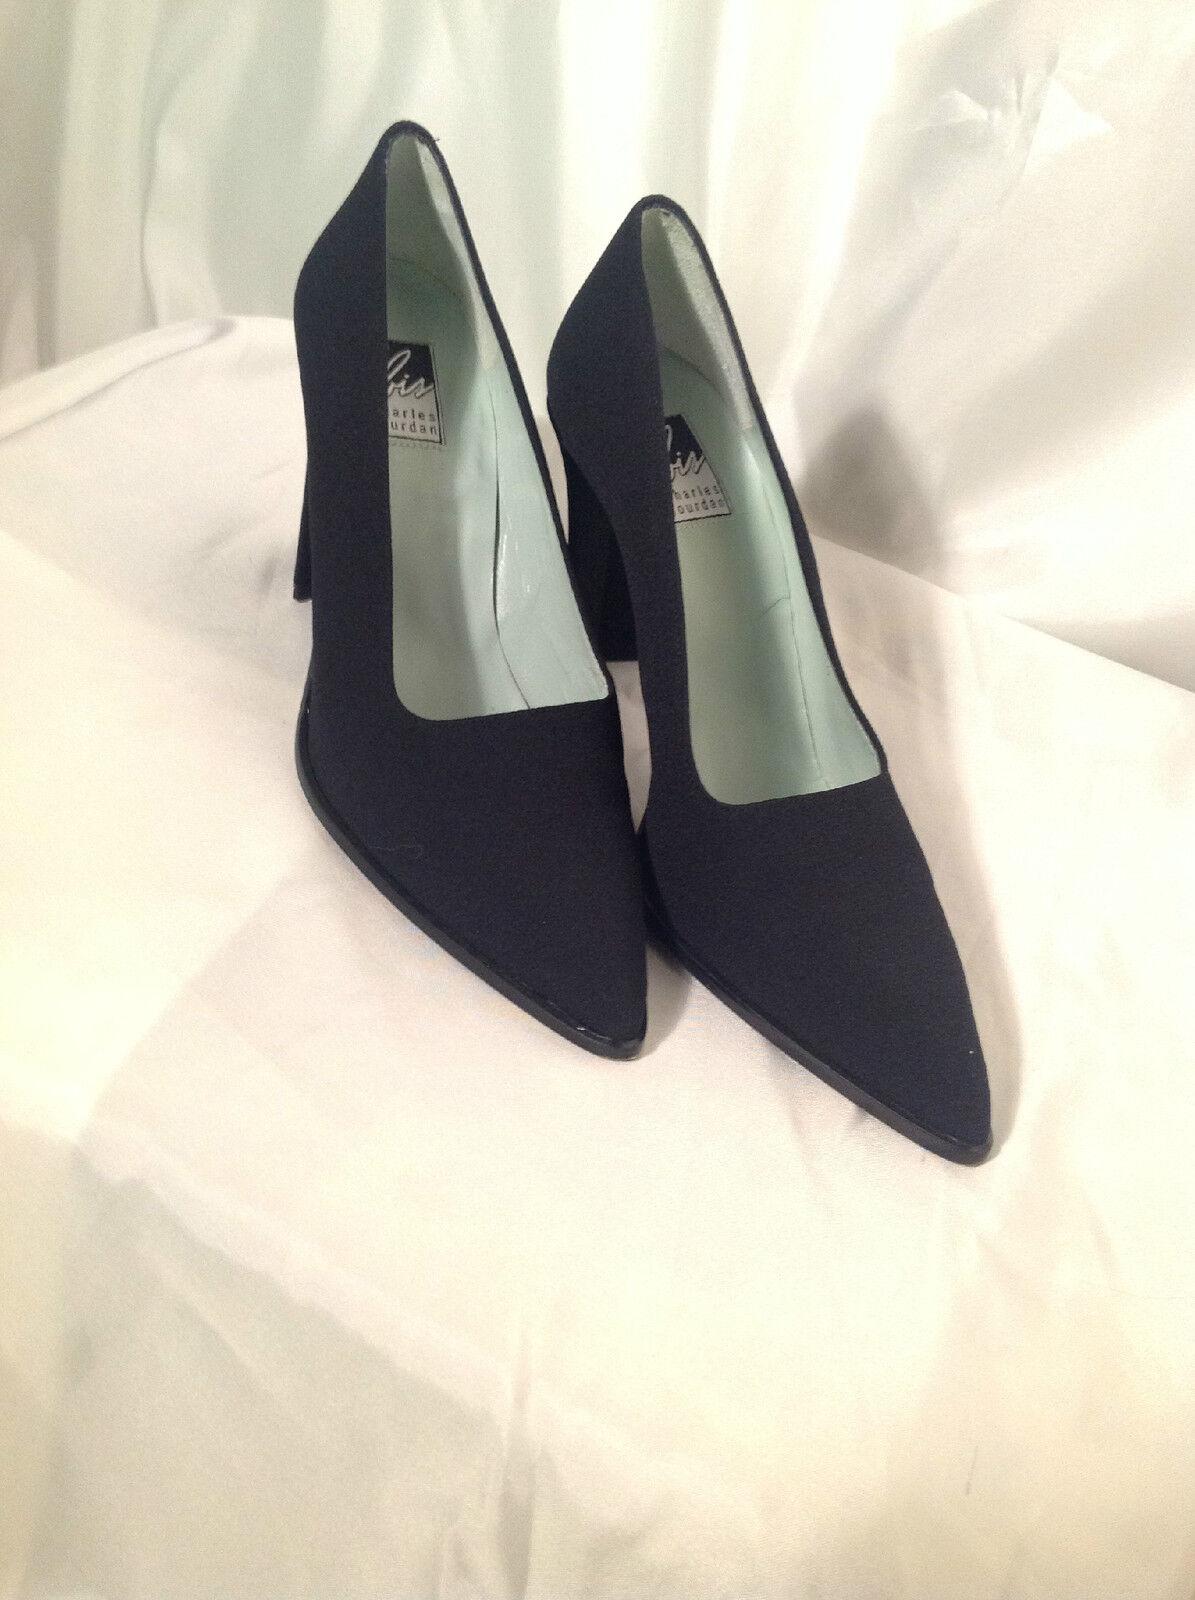 Beautiful Black Classic Charles Jourdan Classic Heels, PUMPS SIZE 8.5 New